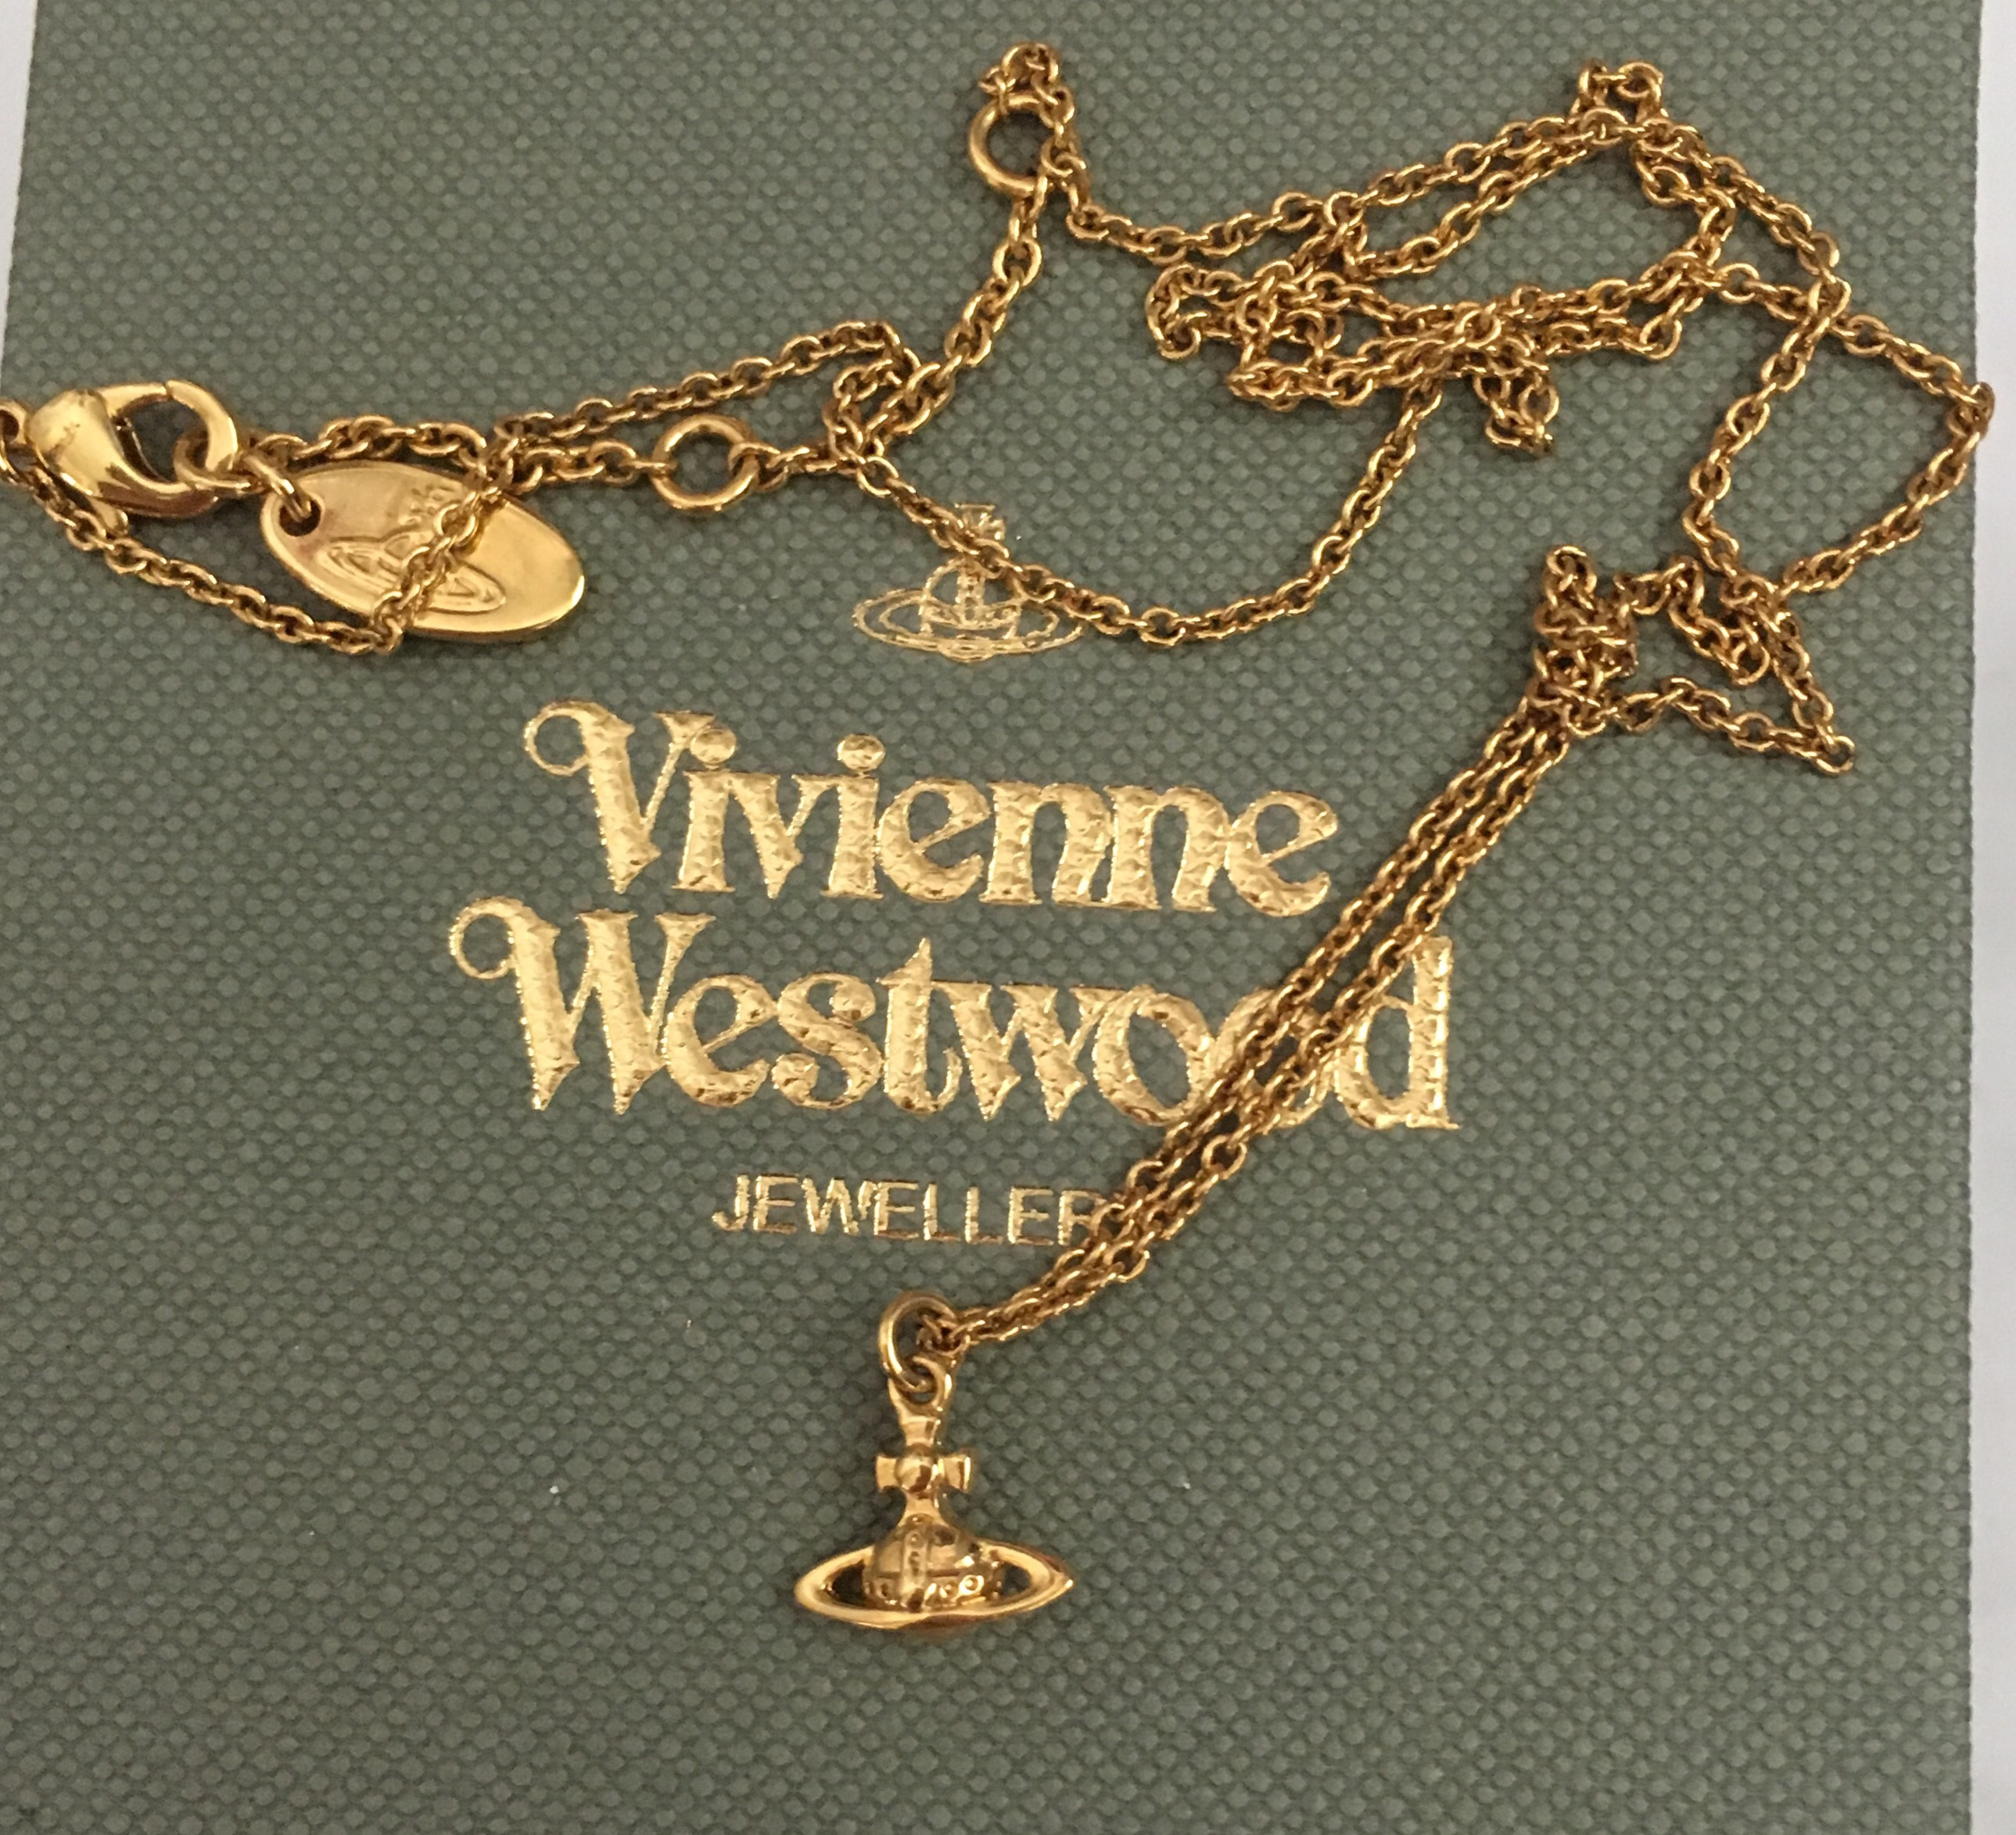 Vivienne Westwood gold necklace